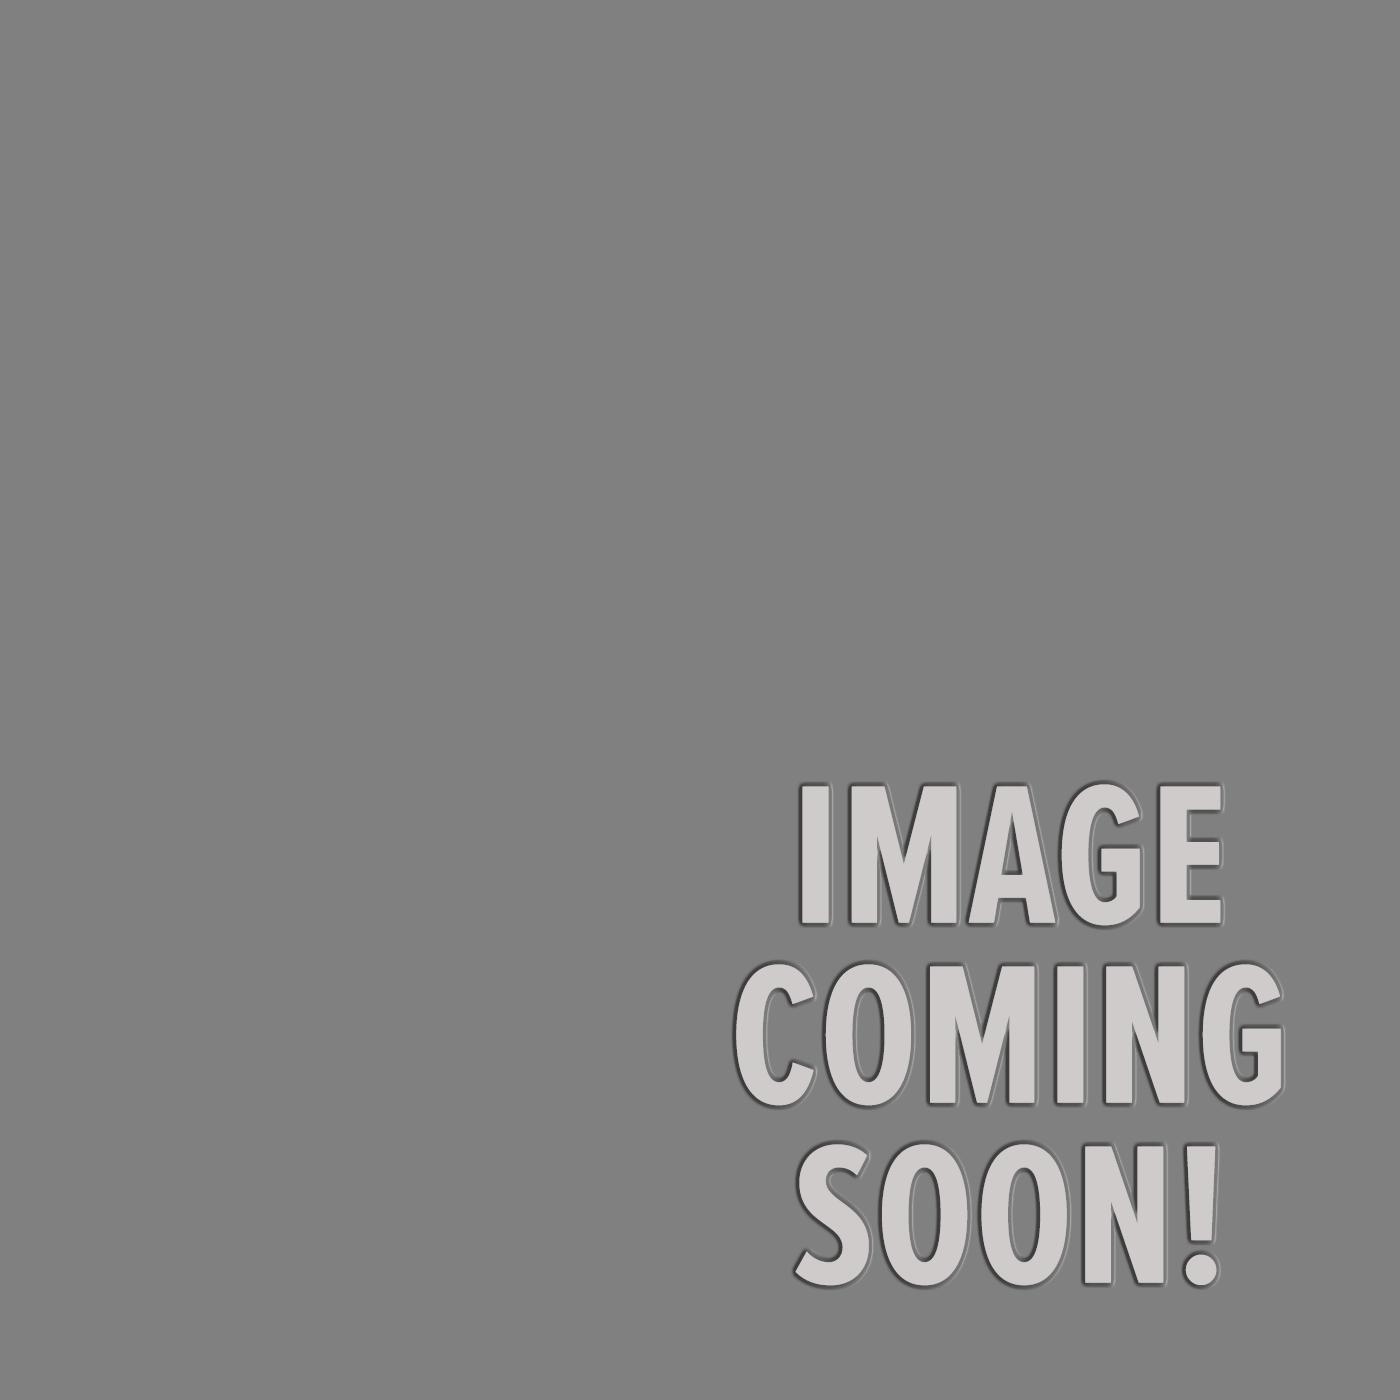 Image for EJ17 Medium Phos Bronze (13-56) Acoustic Guitar Strings from SamAsh